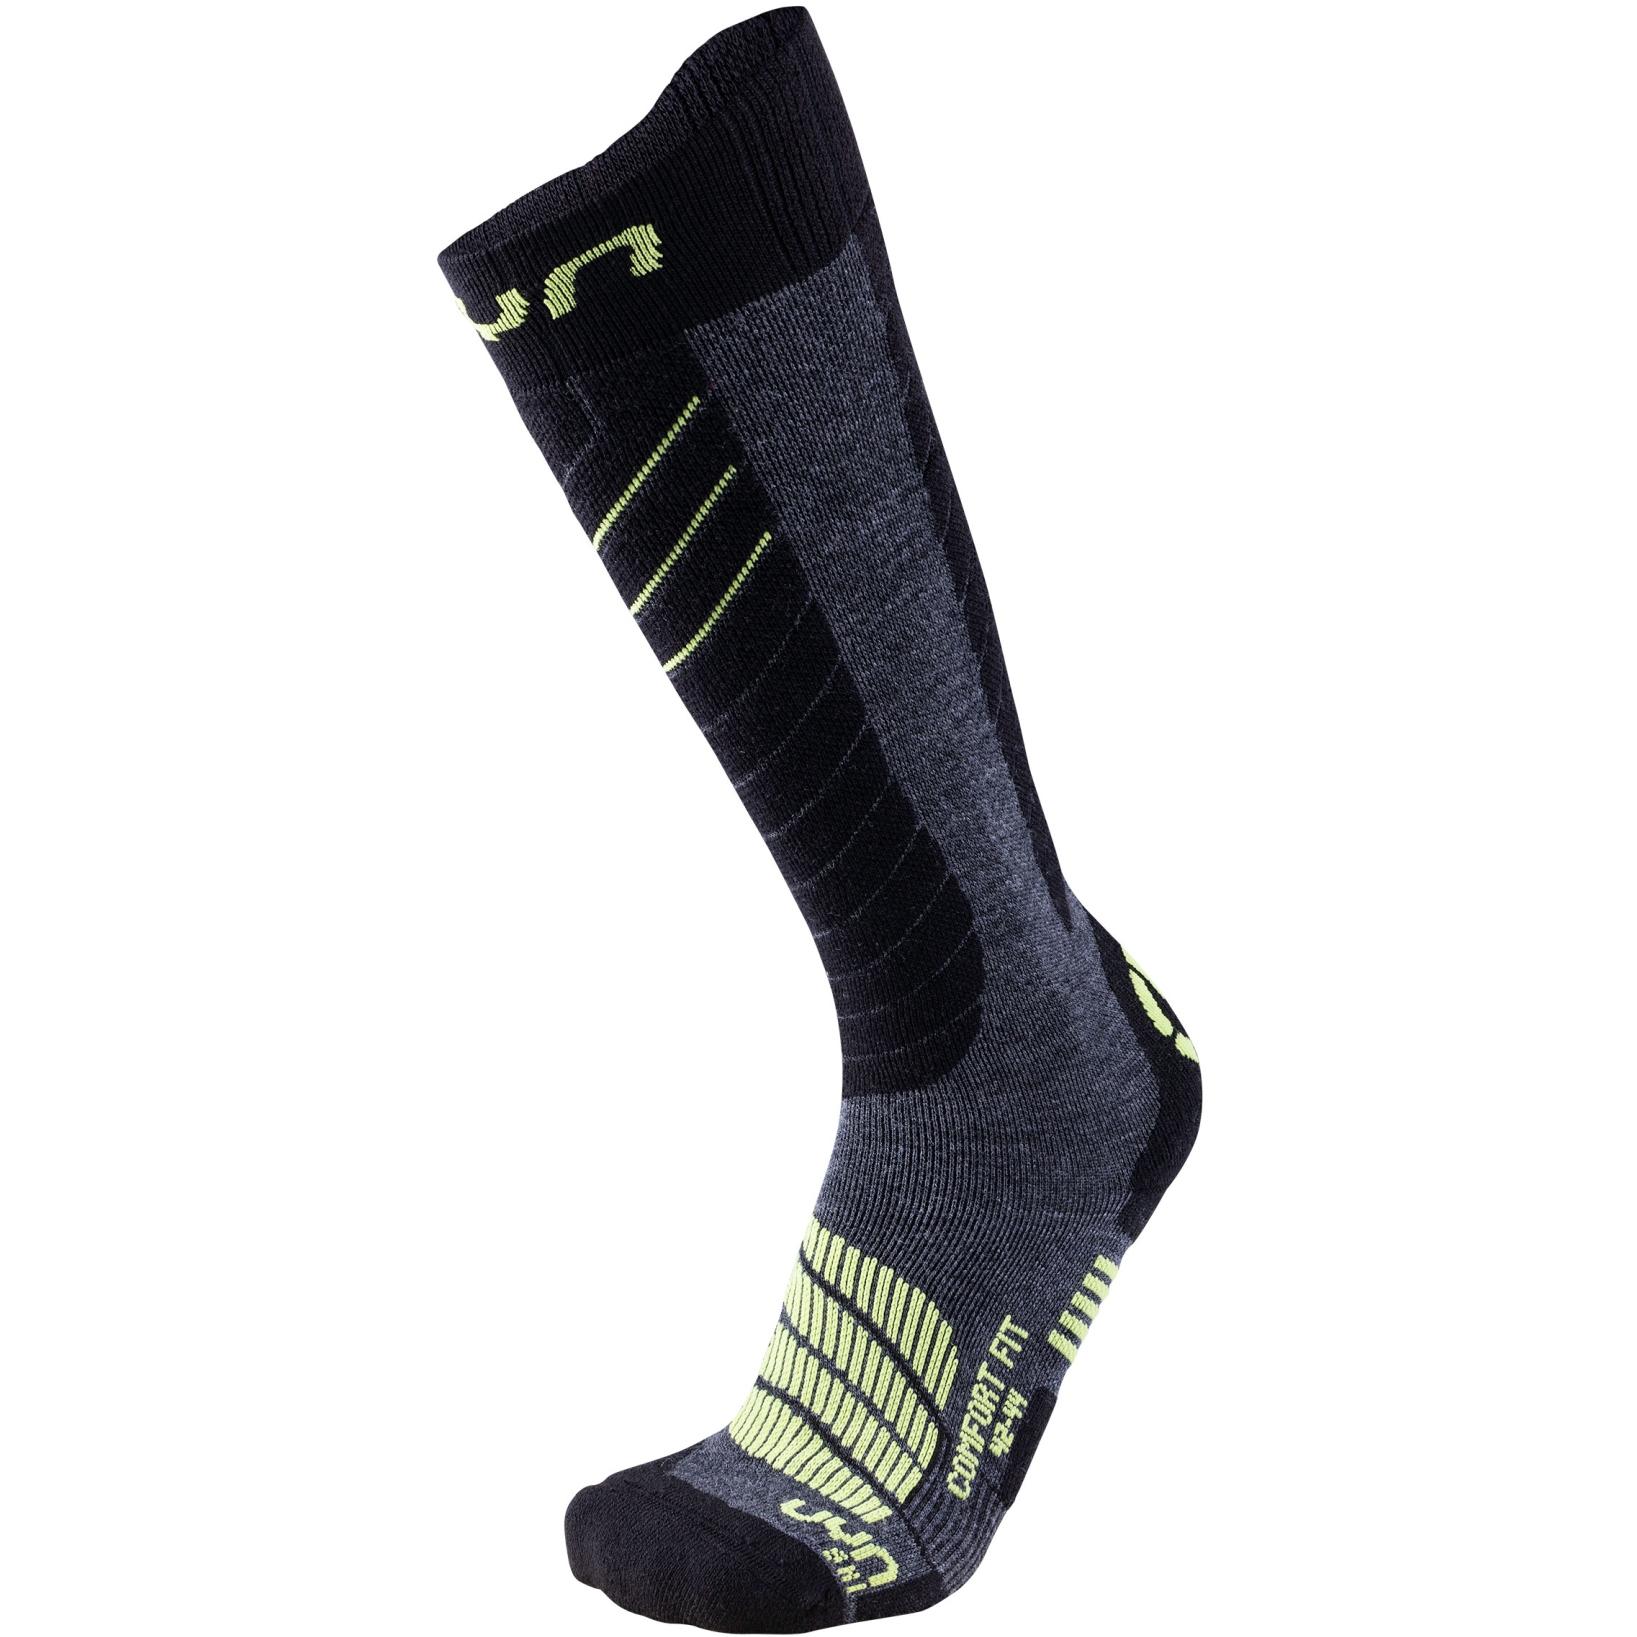 UYN Comfort Fit Men's Ski Socks - Medium Grey Melange/Green Lime